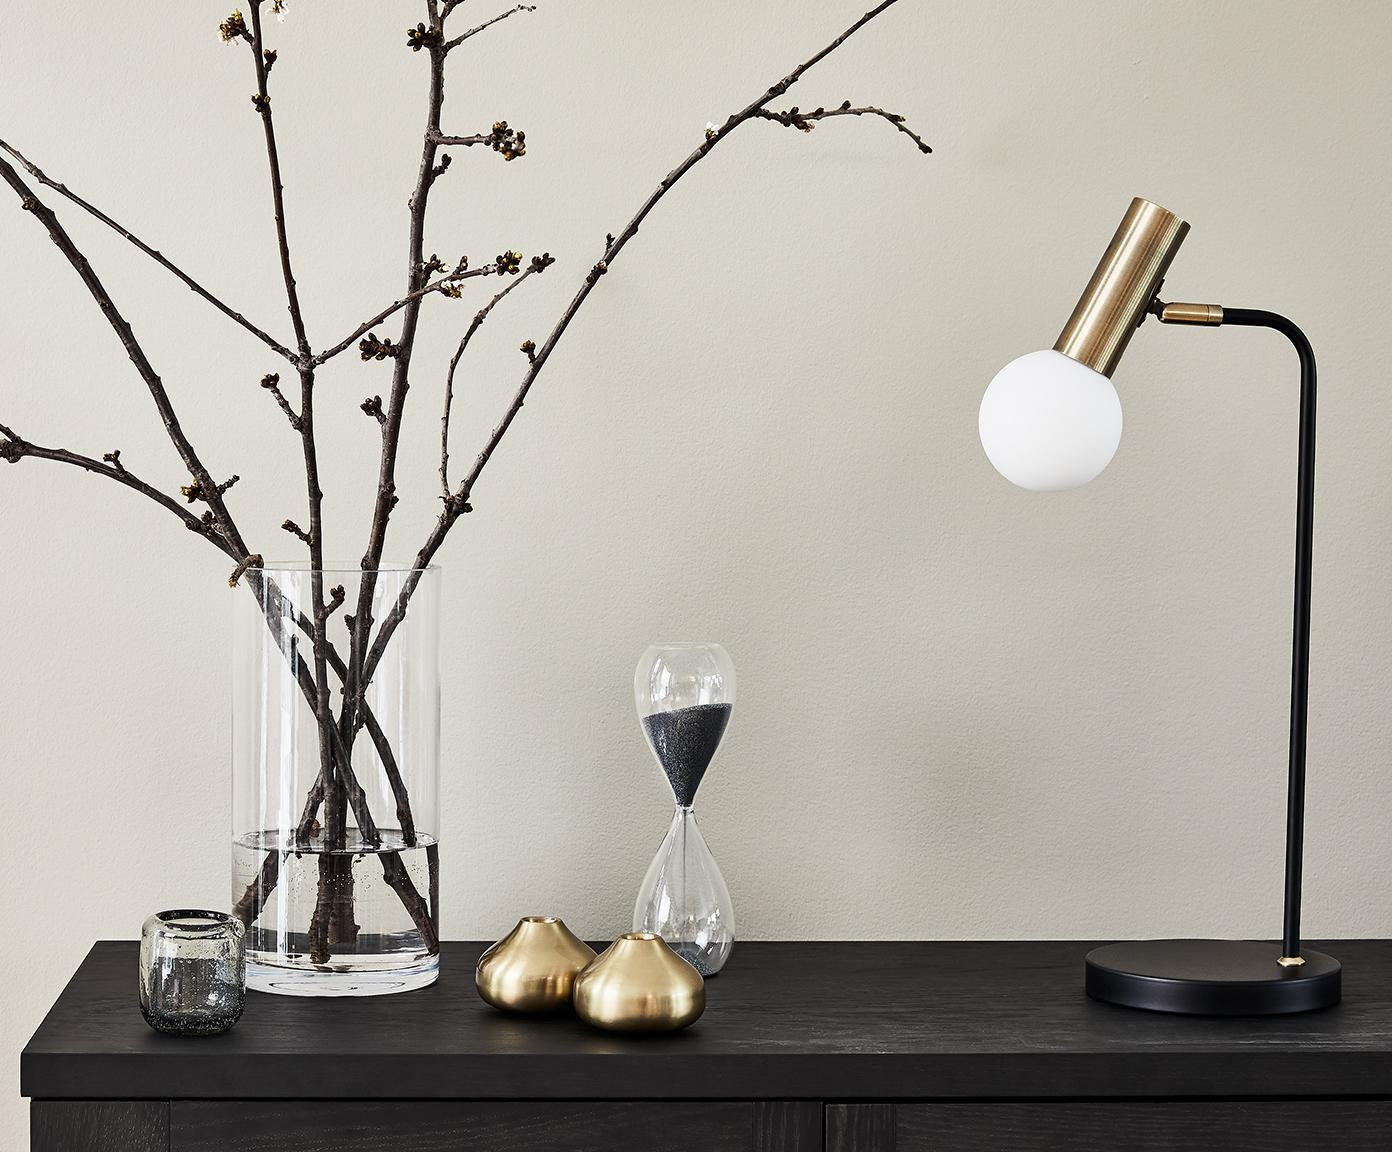 LED tafellamp Wilson, Lampvoet: metaal, Lampenkap: glas, Zwart, 22 x 54 cm